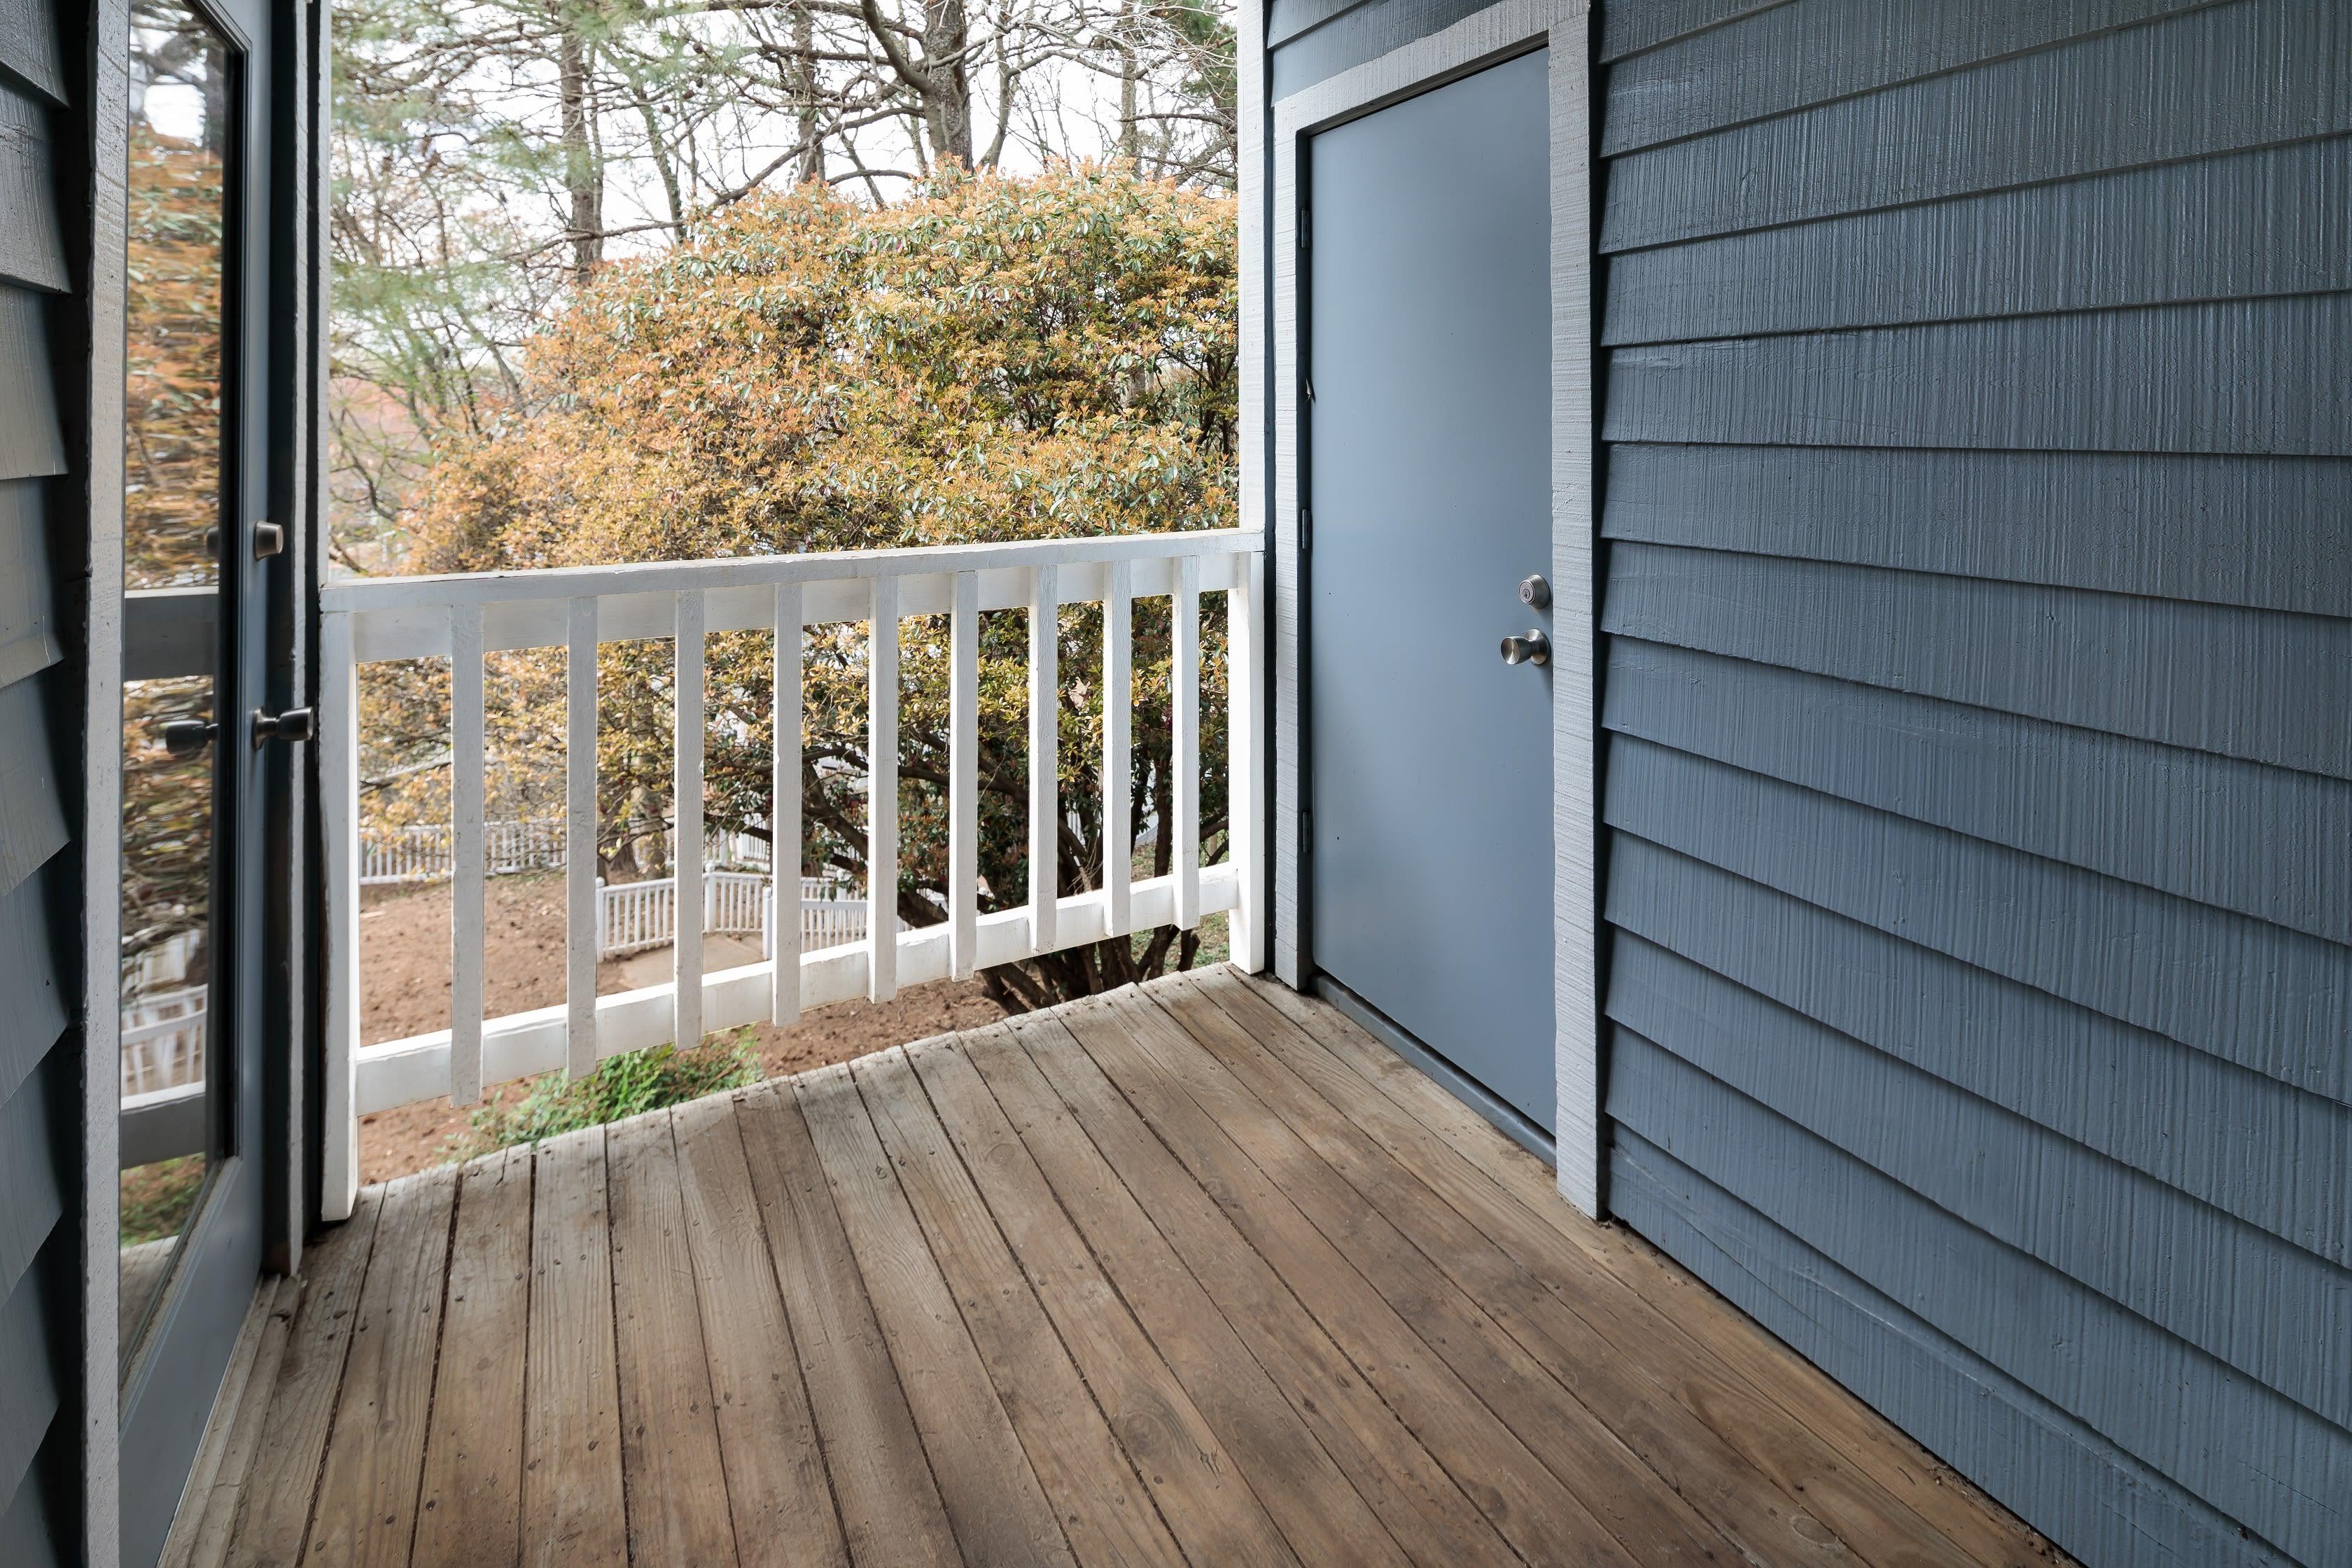 A private balcony at The Everette at East Cobb in Marietta, Georgia